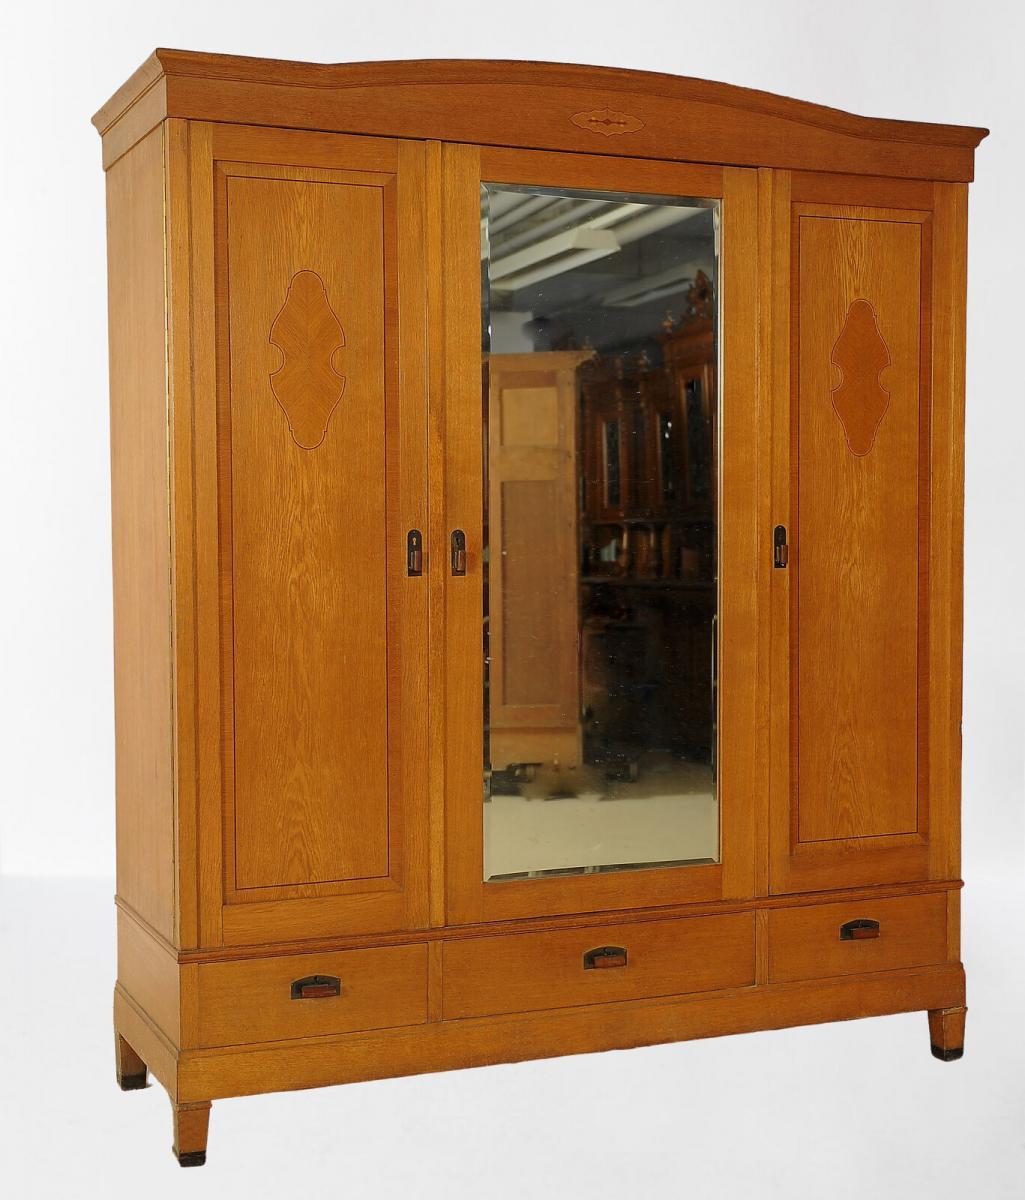 Großer dreitüriger Jugendstil Kleiderschrank aus Eichenholz Antik Kolosseum 1